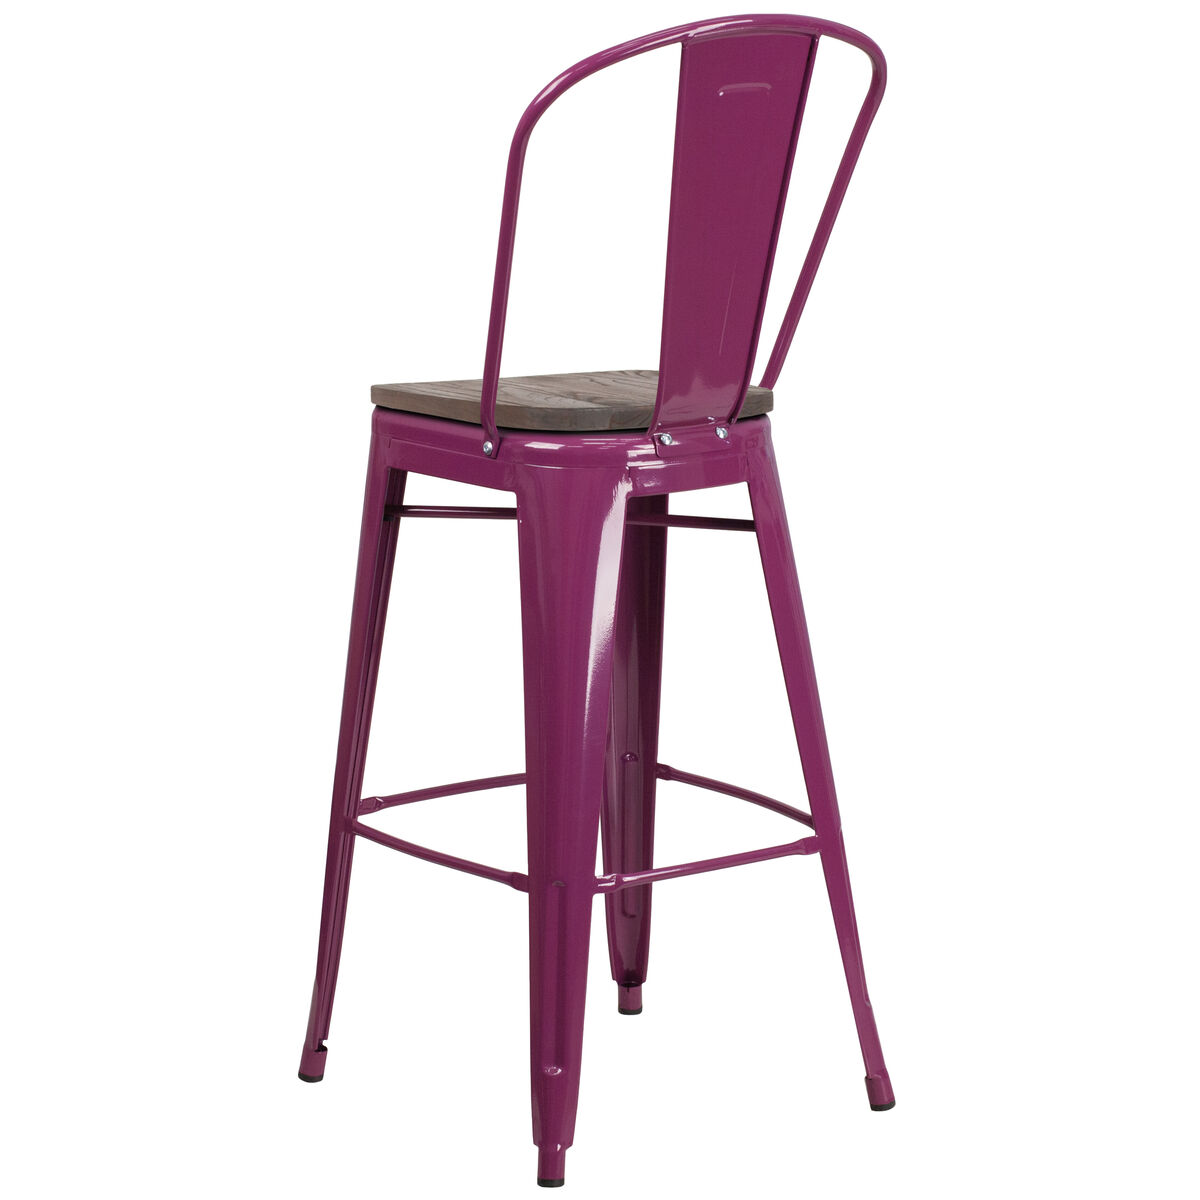 30 Purple Metal Bar Stool Et 3534 30 Pur Wd Gg Bizchaircom